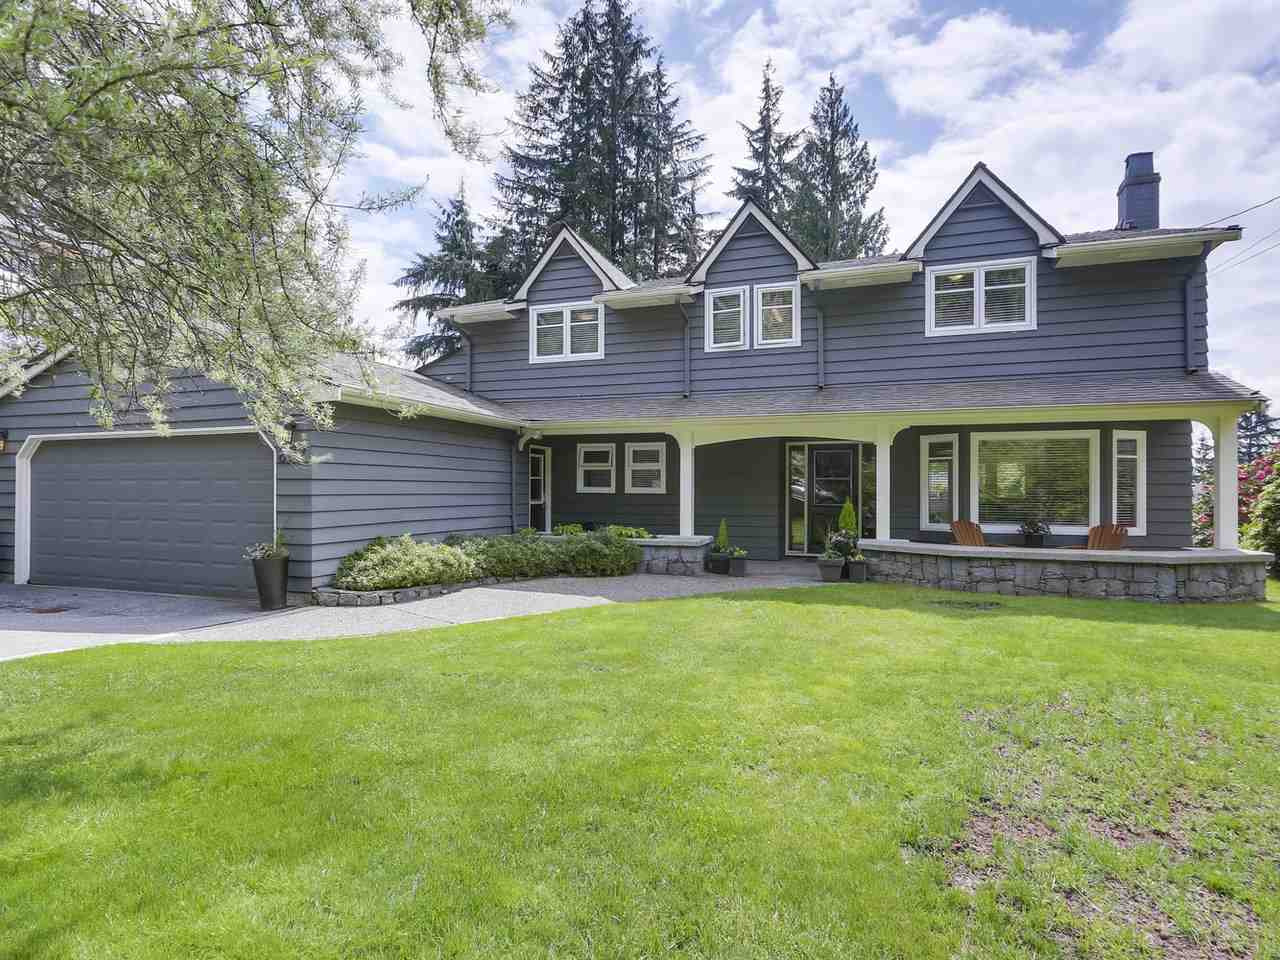 Sold: 877 Prospect Avenue, North Vancouver, BC